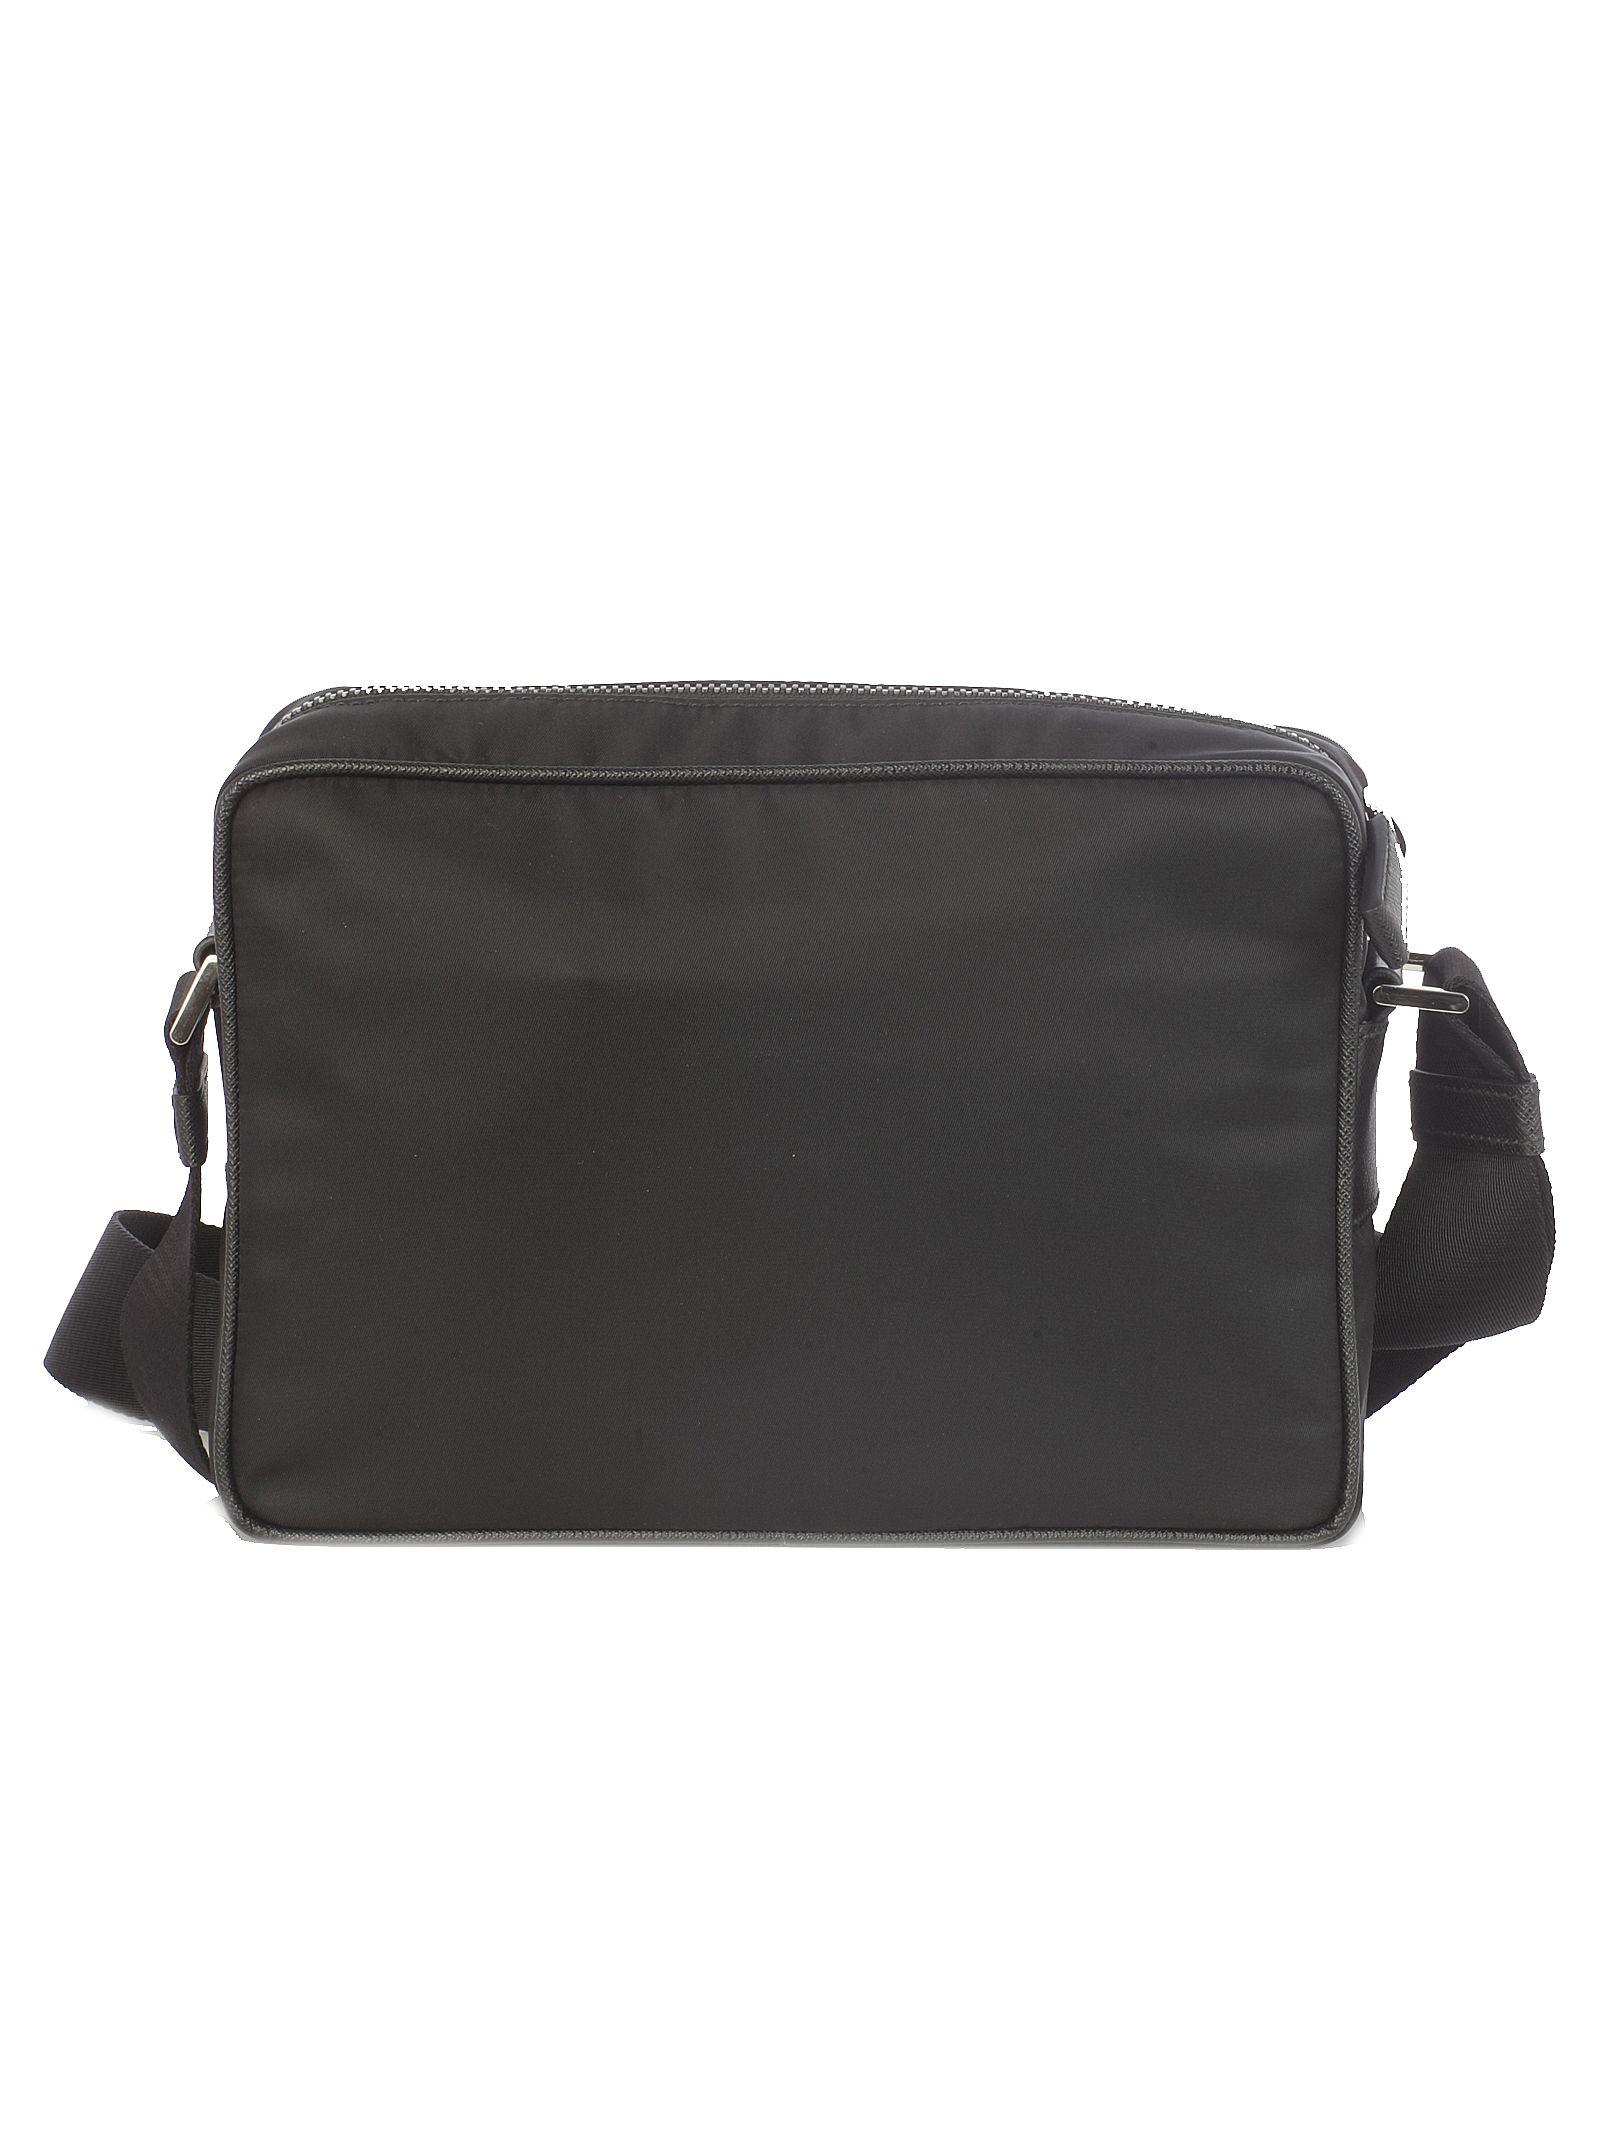 47230b95dd Prada Prada Logo Shoulder Bag - Black - 10784140